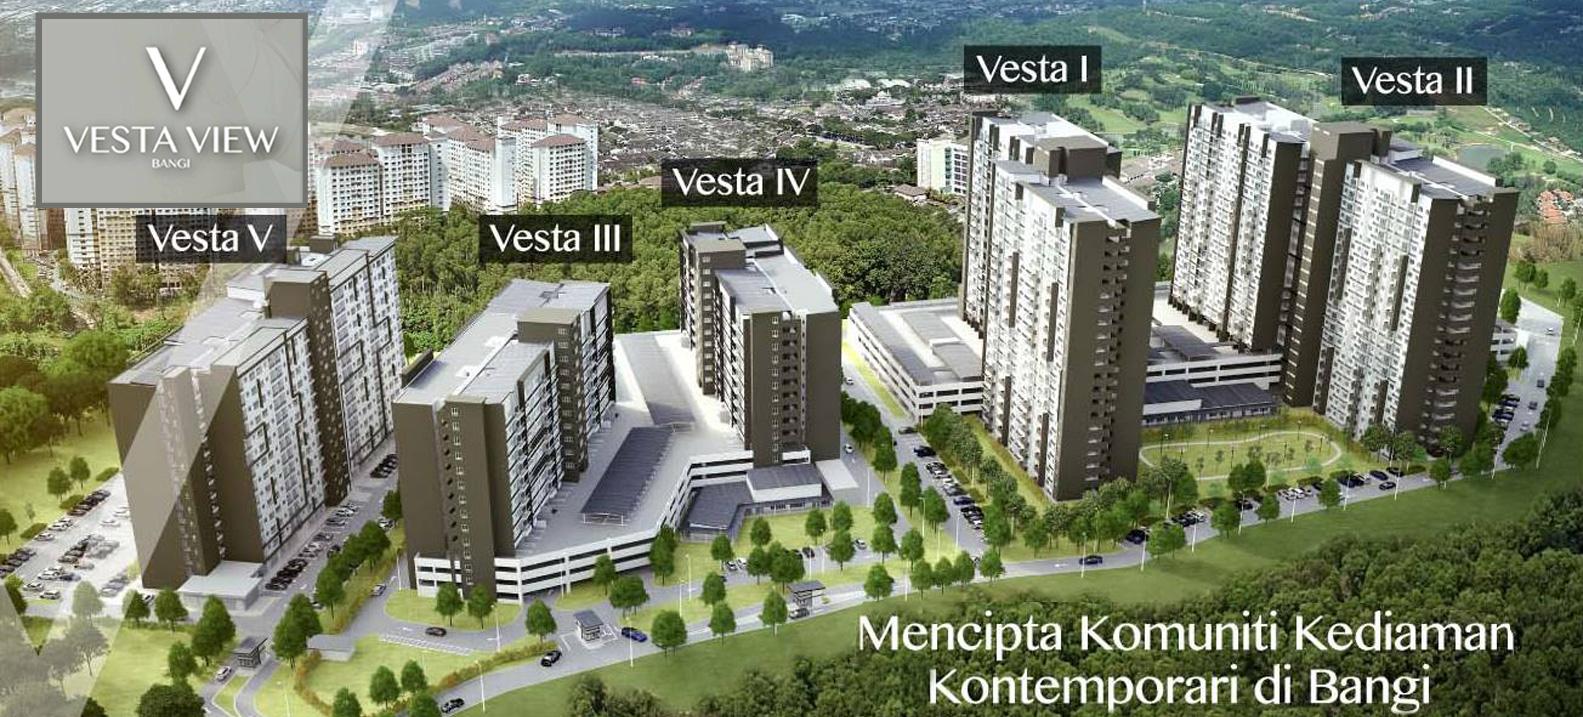 vesta-slider-4